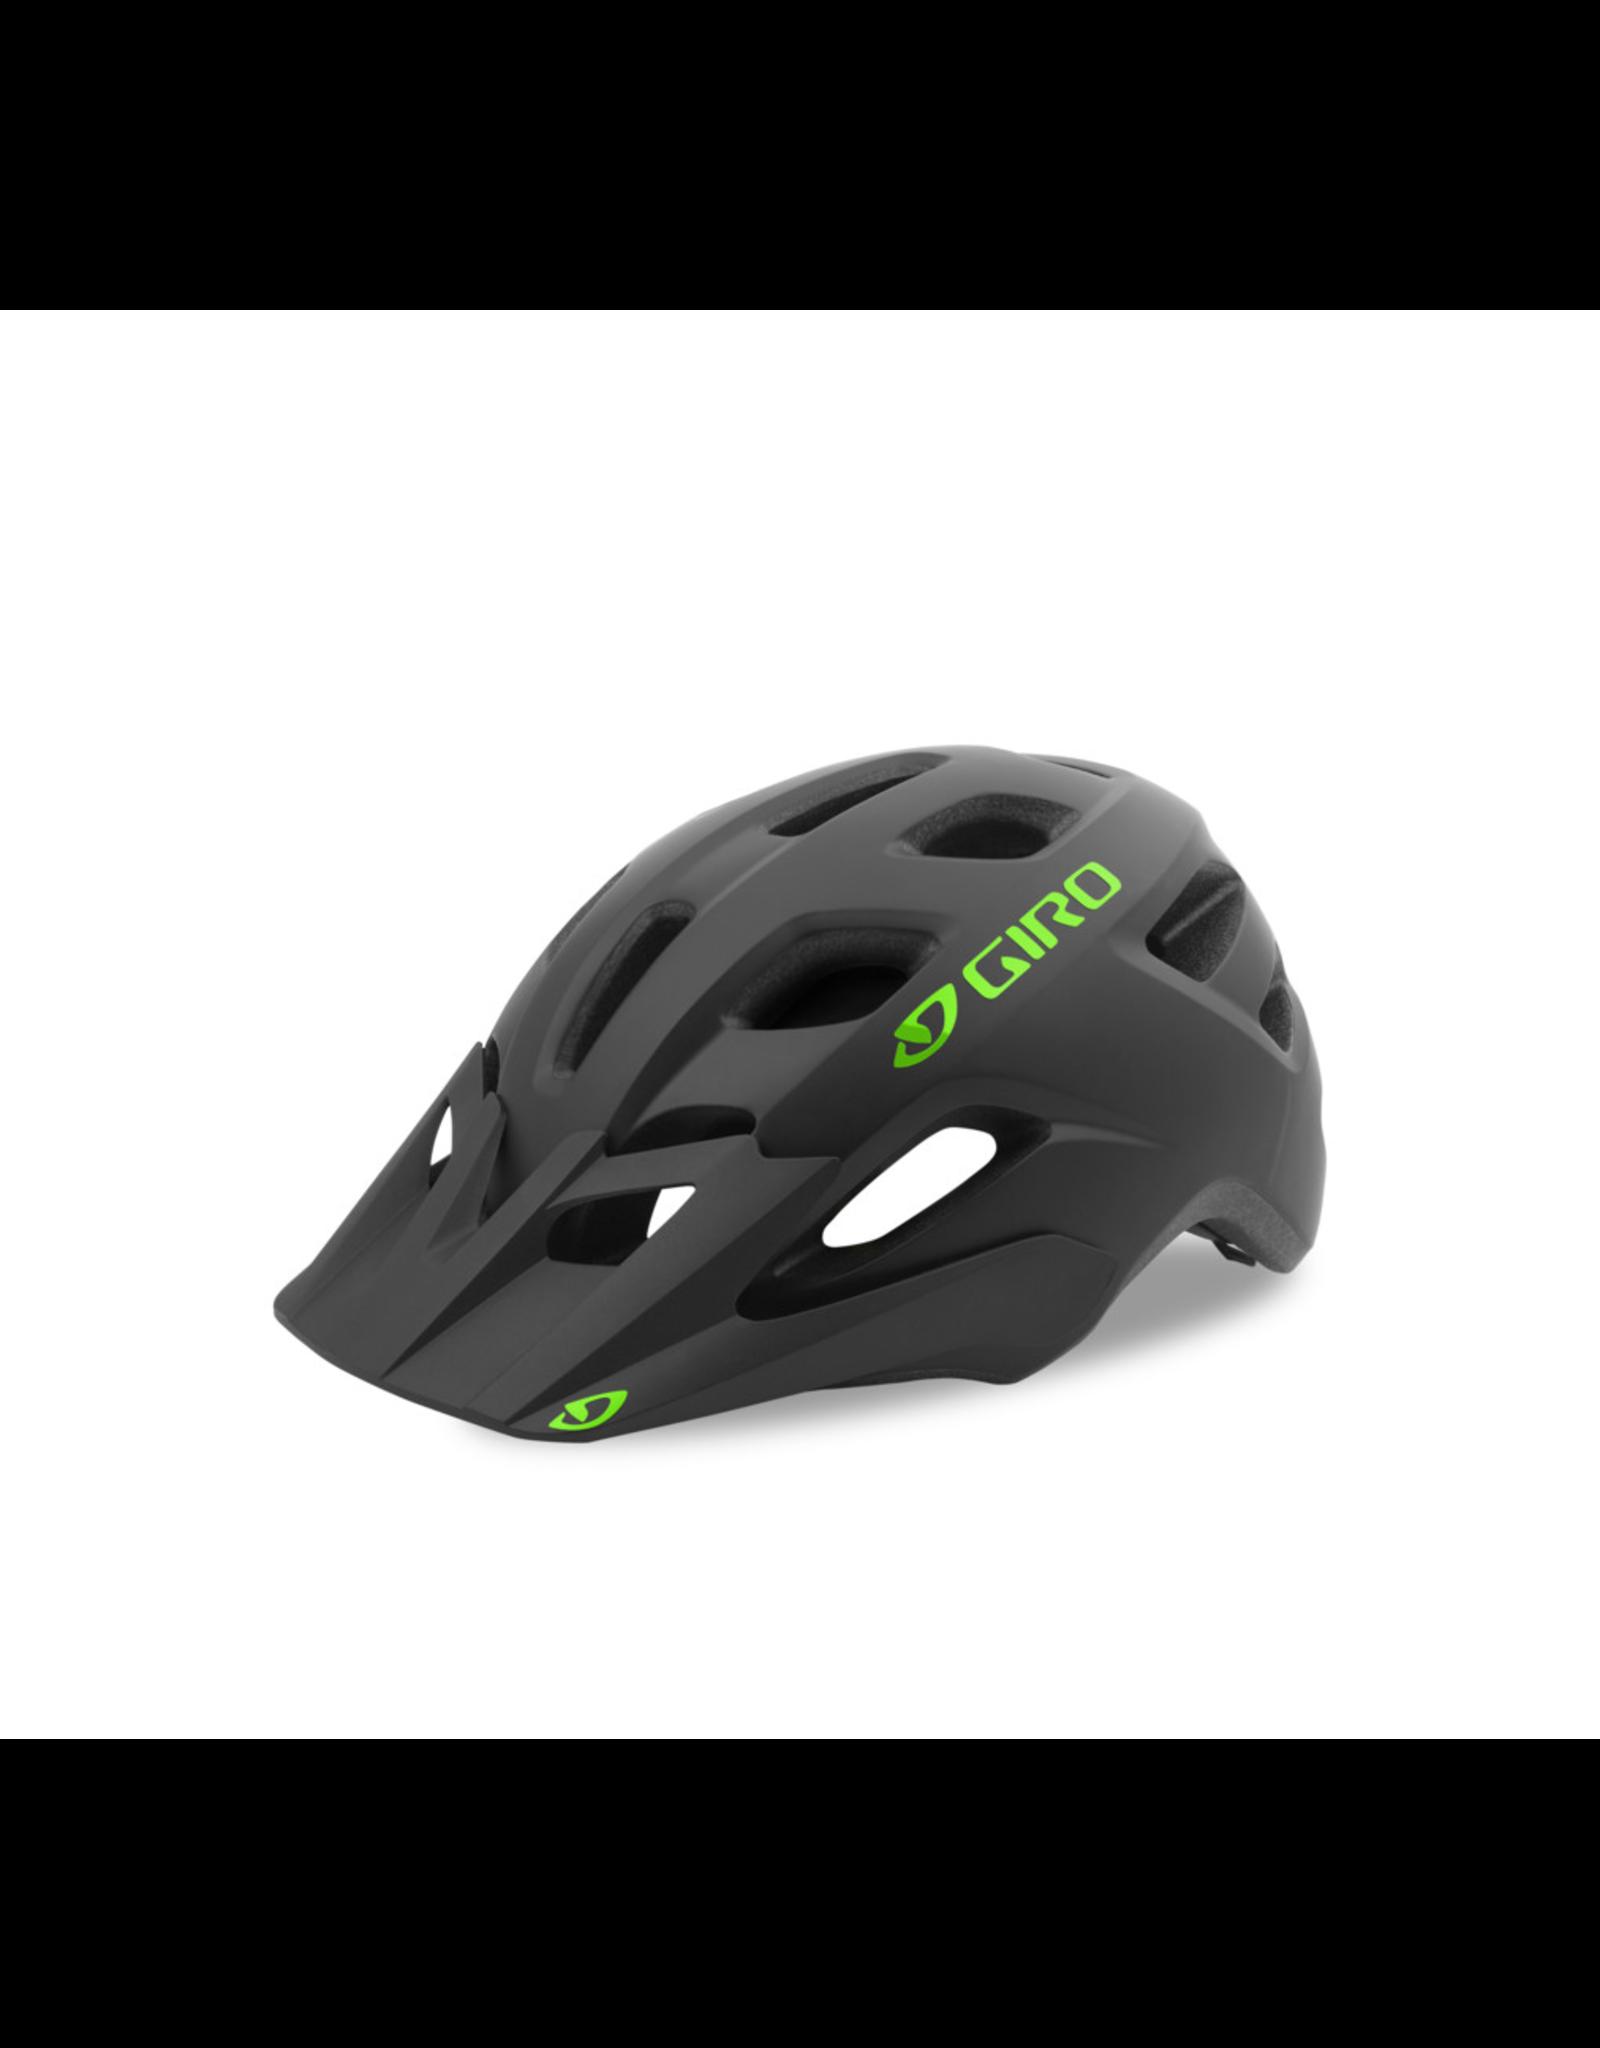 Giro Tremor helmet - Universal youth size